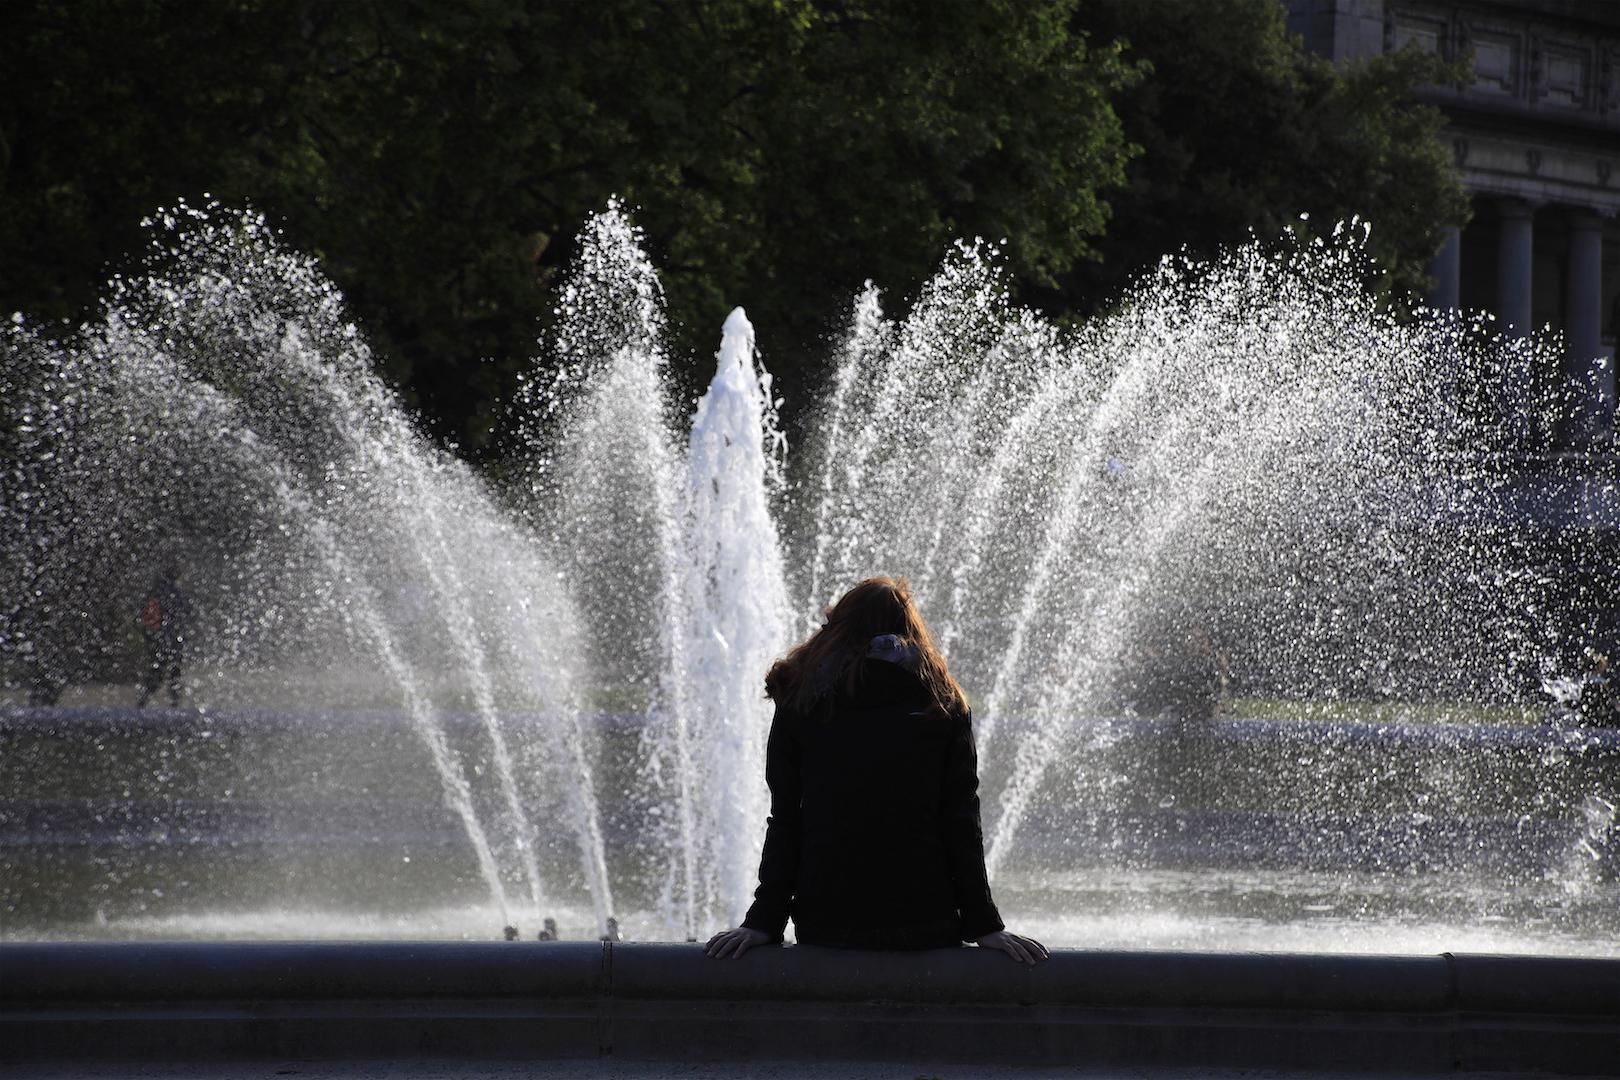 cinquantenaire park woman fountain girl